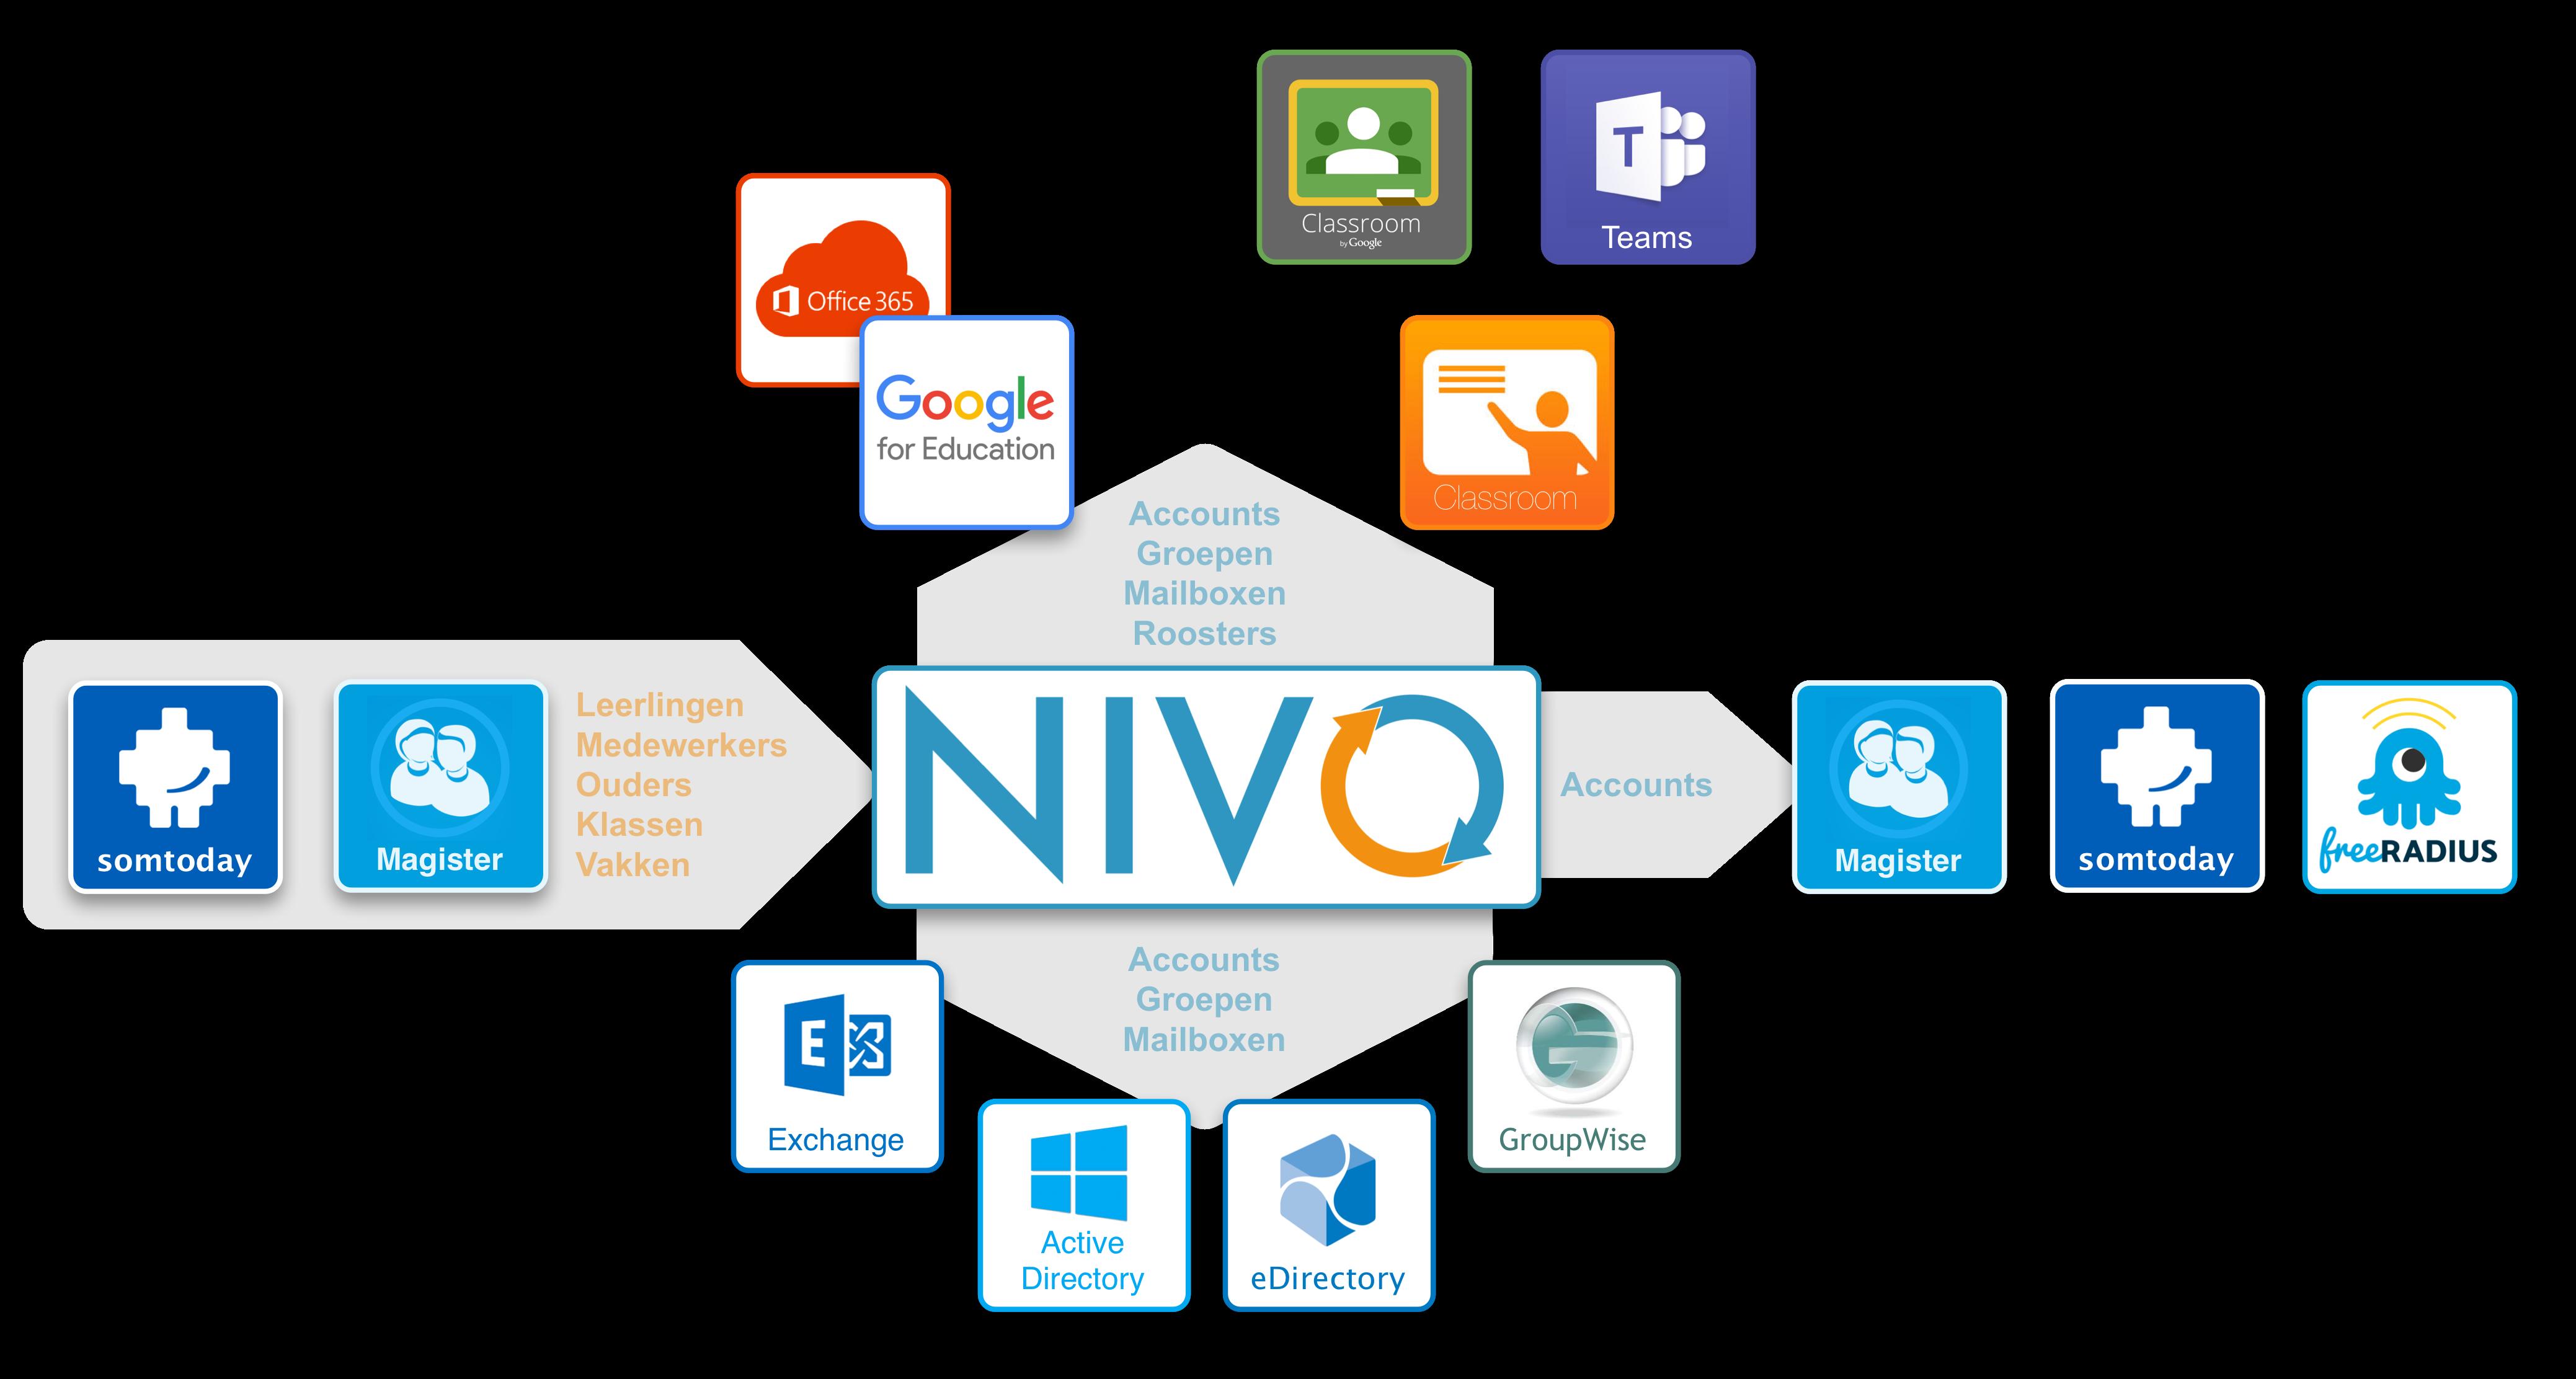 nivo-infographic-2018